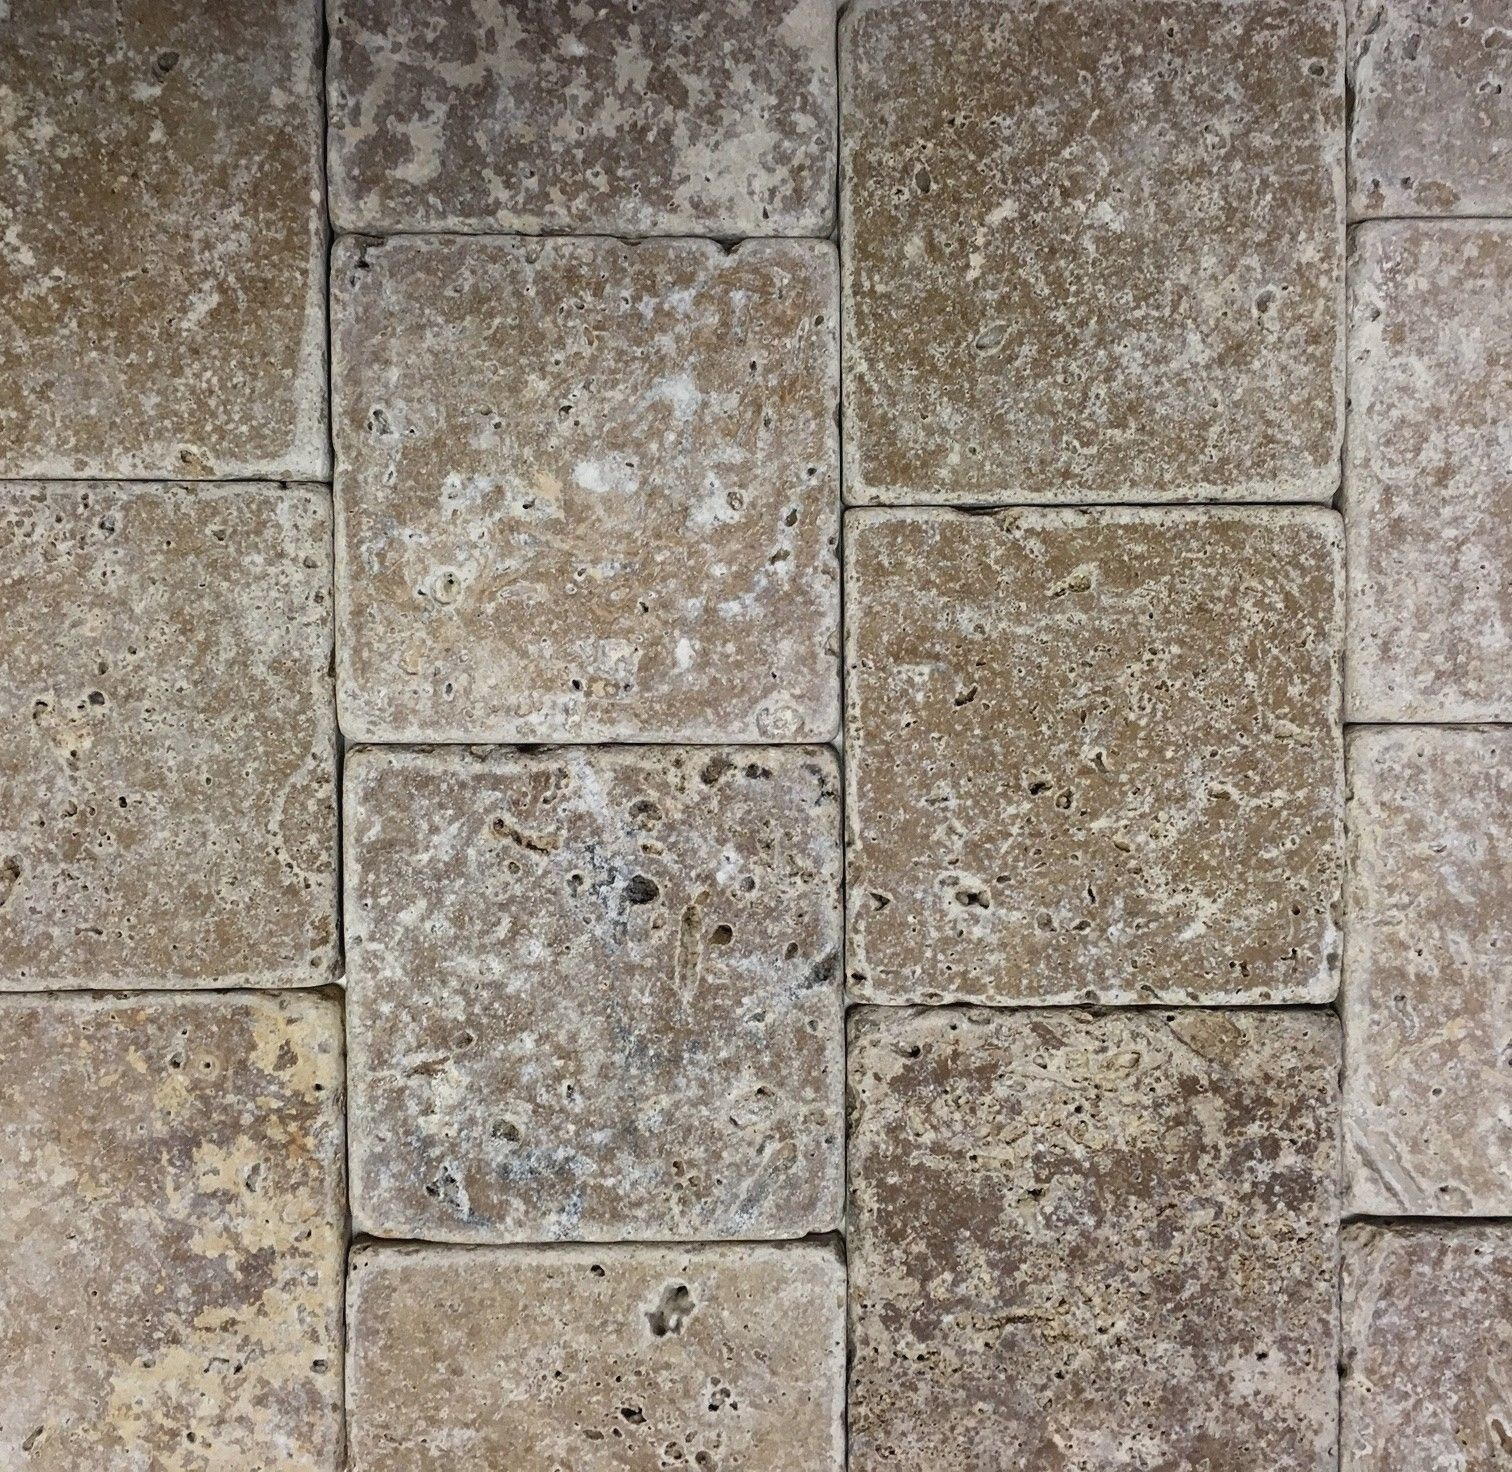 - $3.89 - Noce 4X4 Tumbled Travertine Tile Backsplash Floor Wall